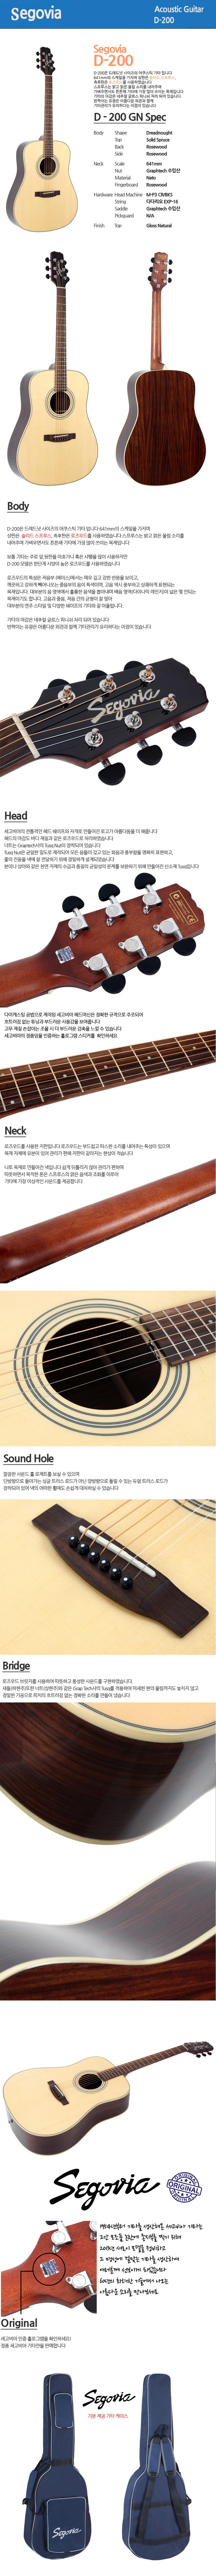 70961f6ada1 기타클릭] 세고비아 D-200/D200/신모델/탑솔리드/입문용 통기타/스탠드 ...